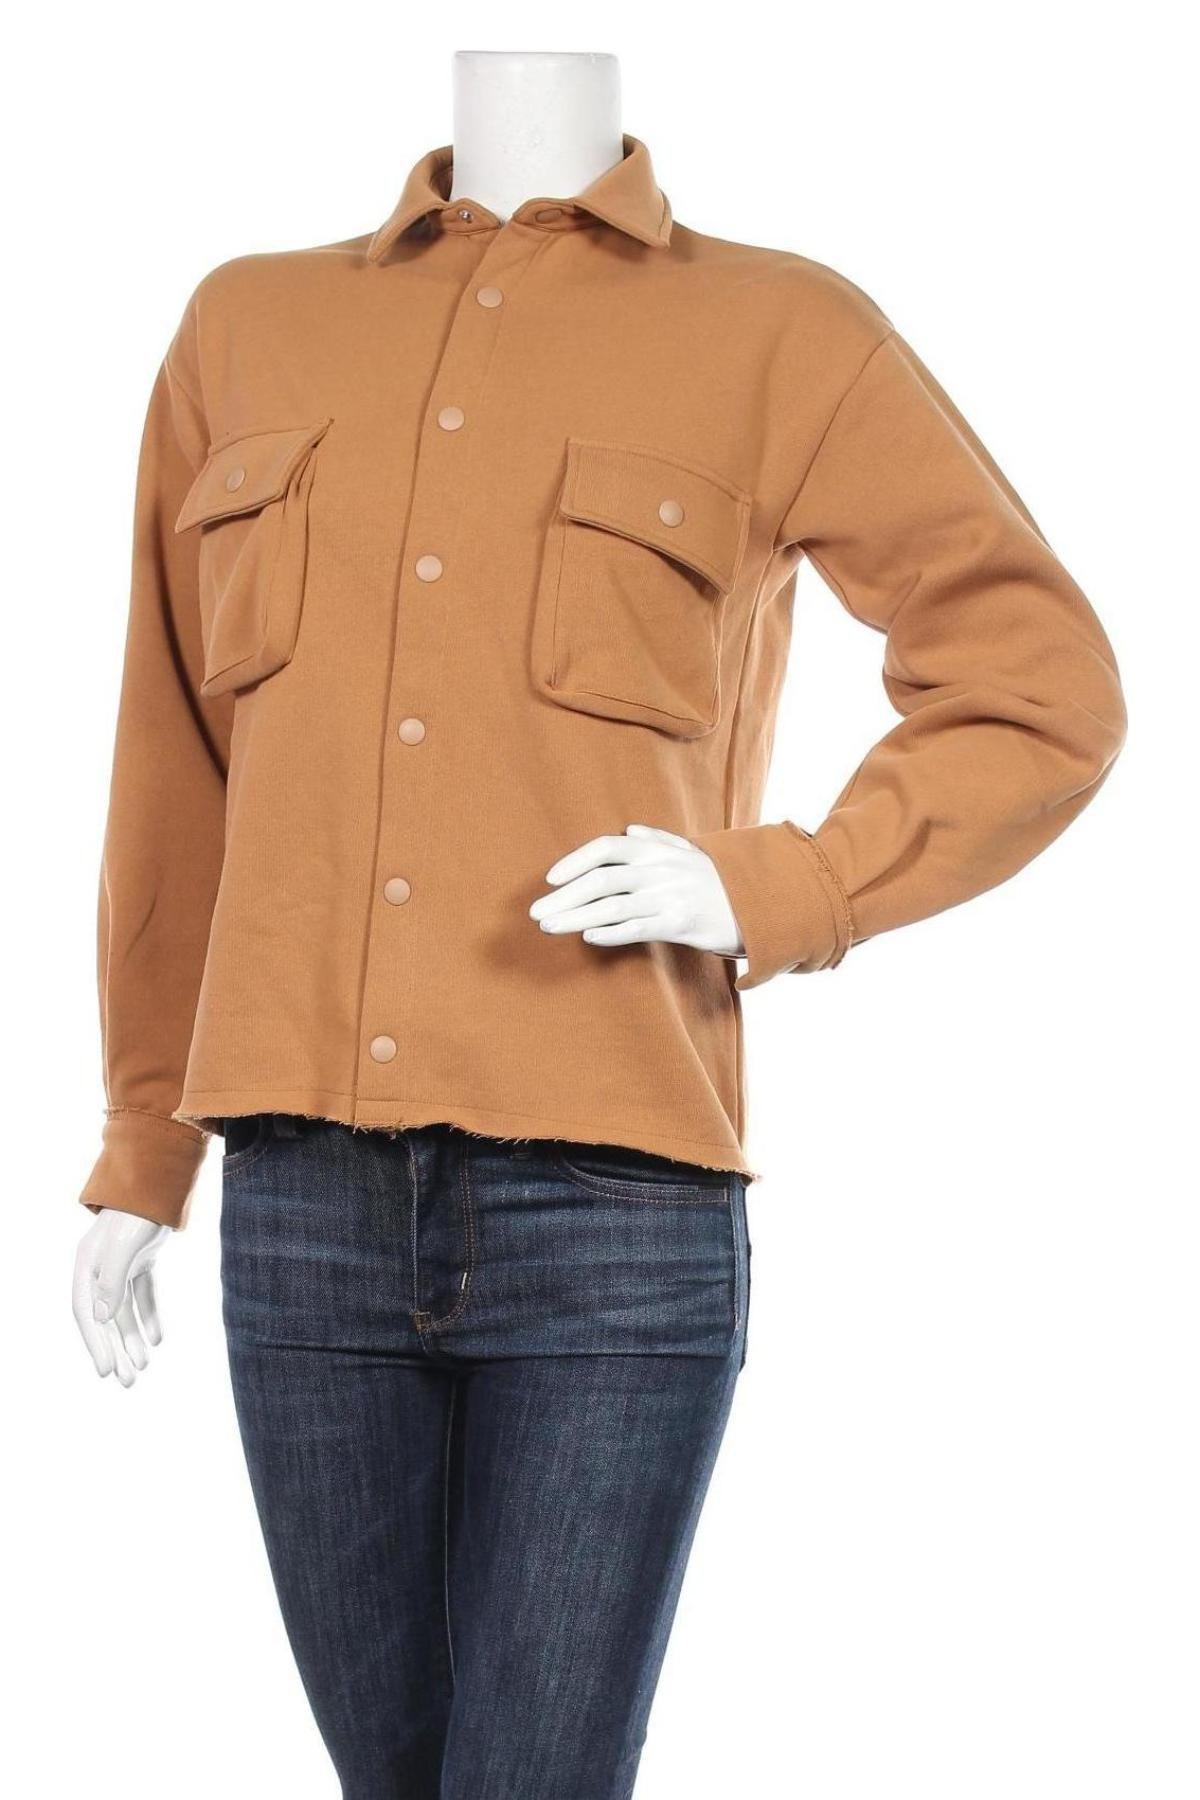 Дамска риза Stefanie Giesinger for Nu-in, Размер XXS, Цвят Кафяв, 52% памук, 48% полиестер, Цена 26,24лв.